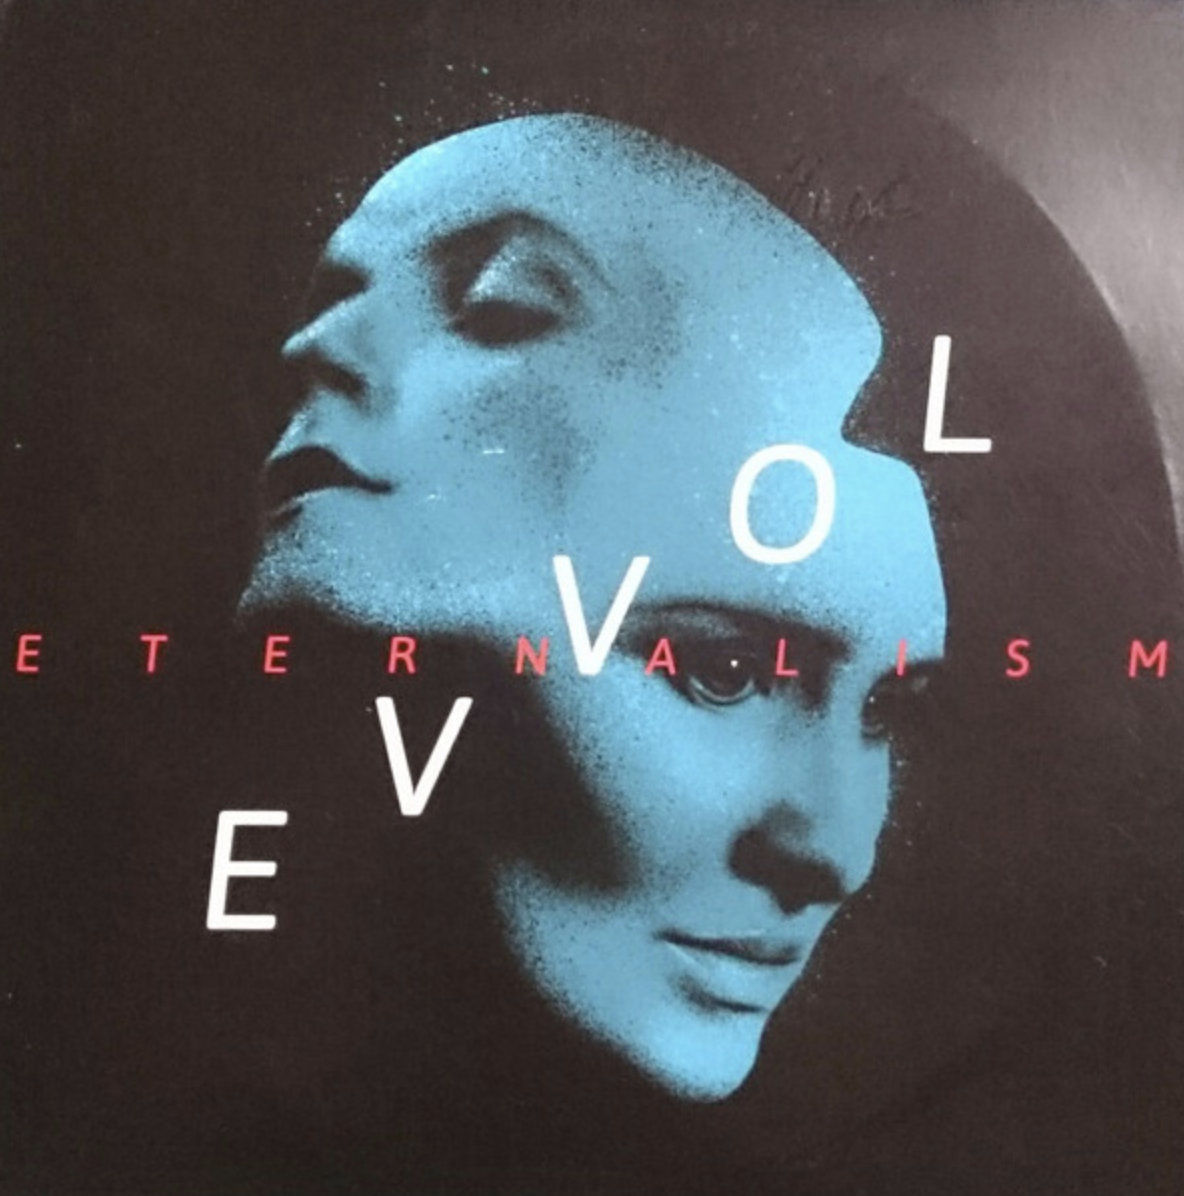 Evvol Eternalism  co-writer/producer/record engineer/mixer